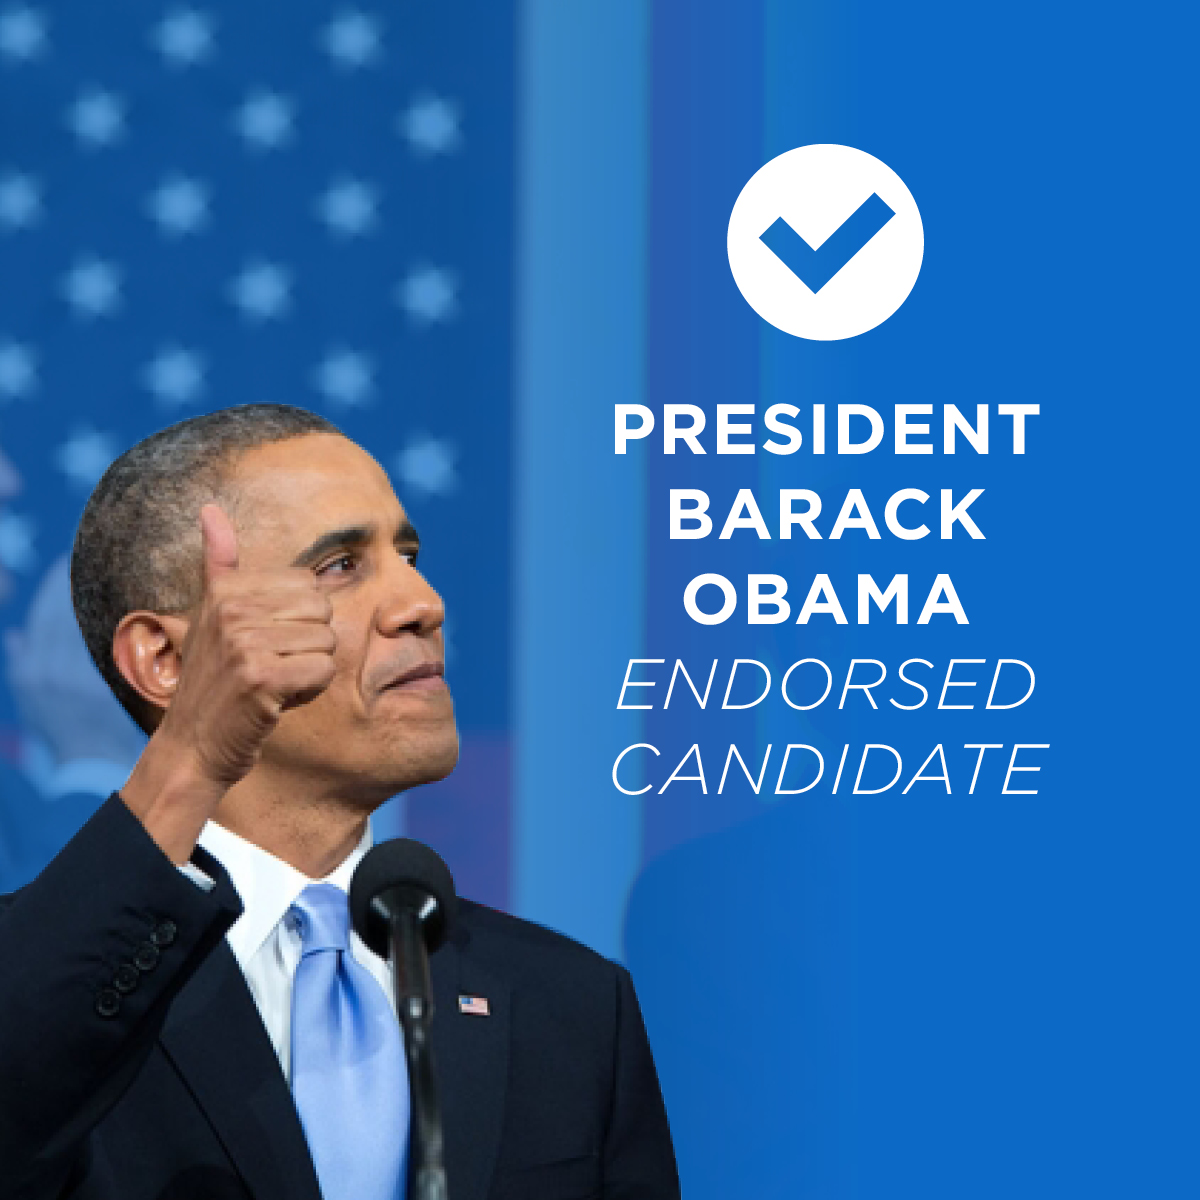 President Barack Obama Endorsed Candidate